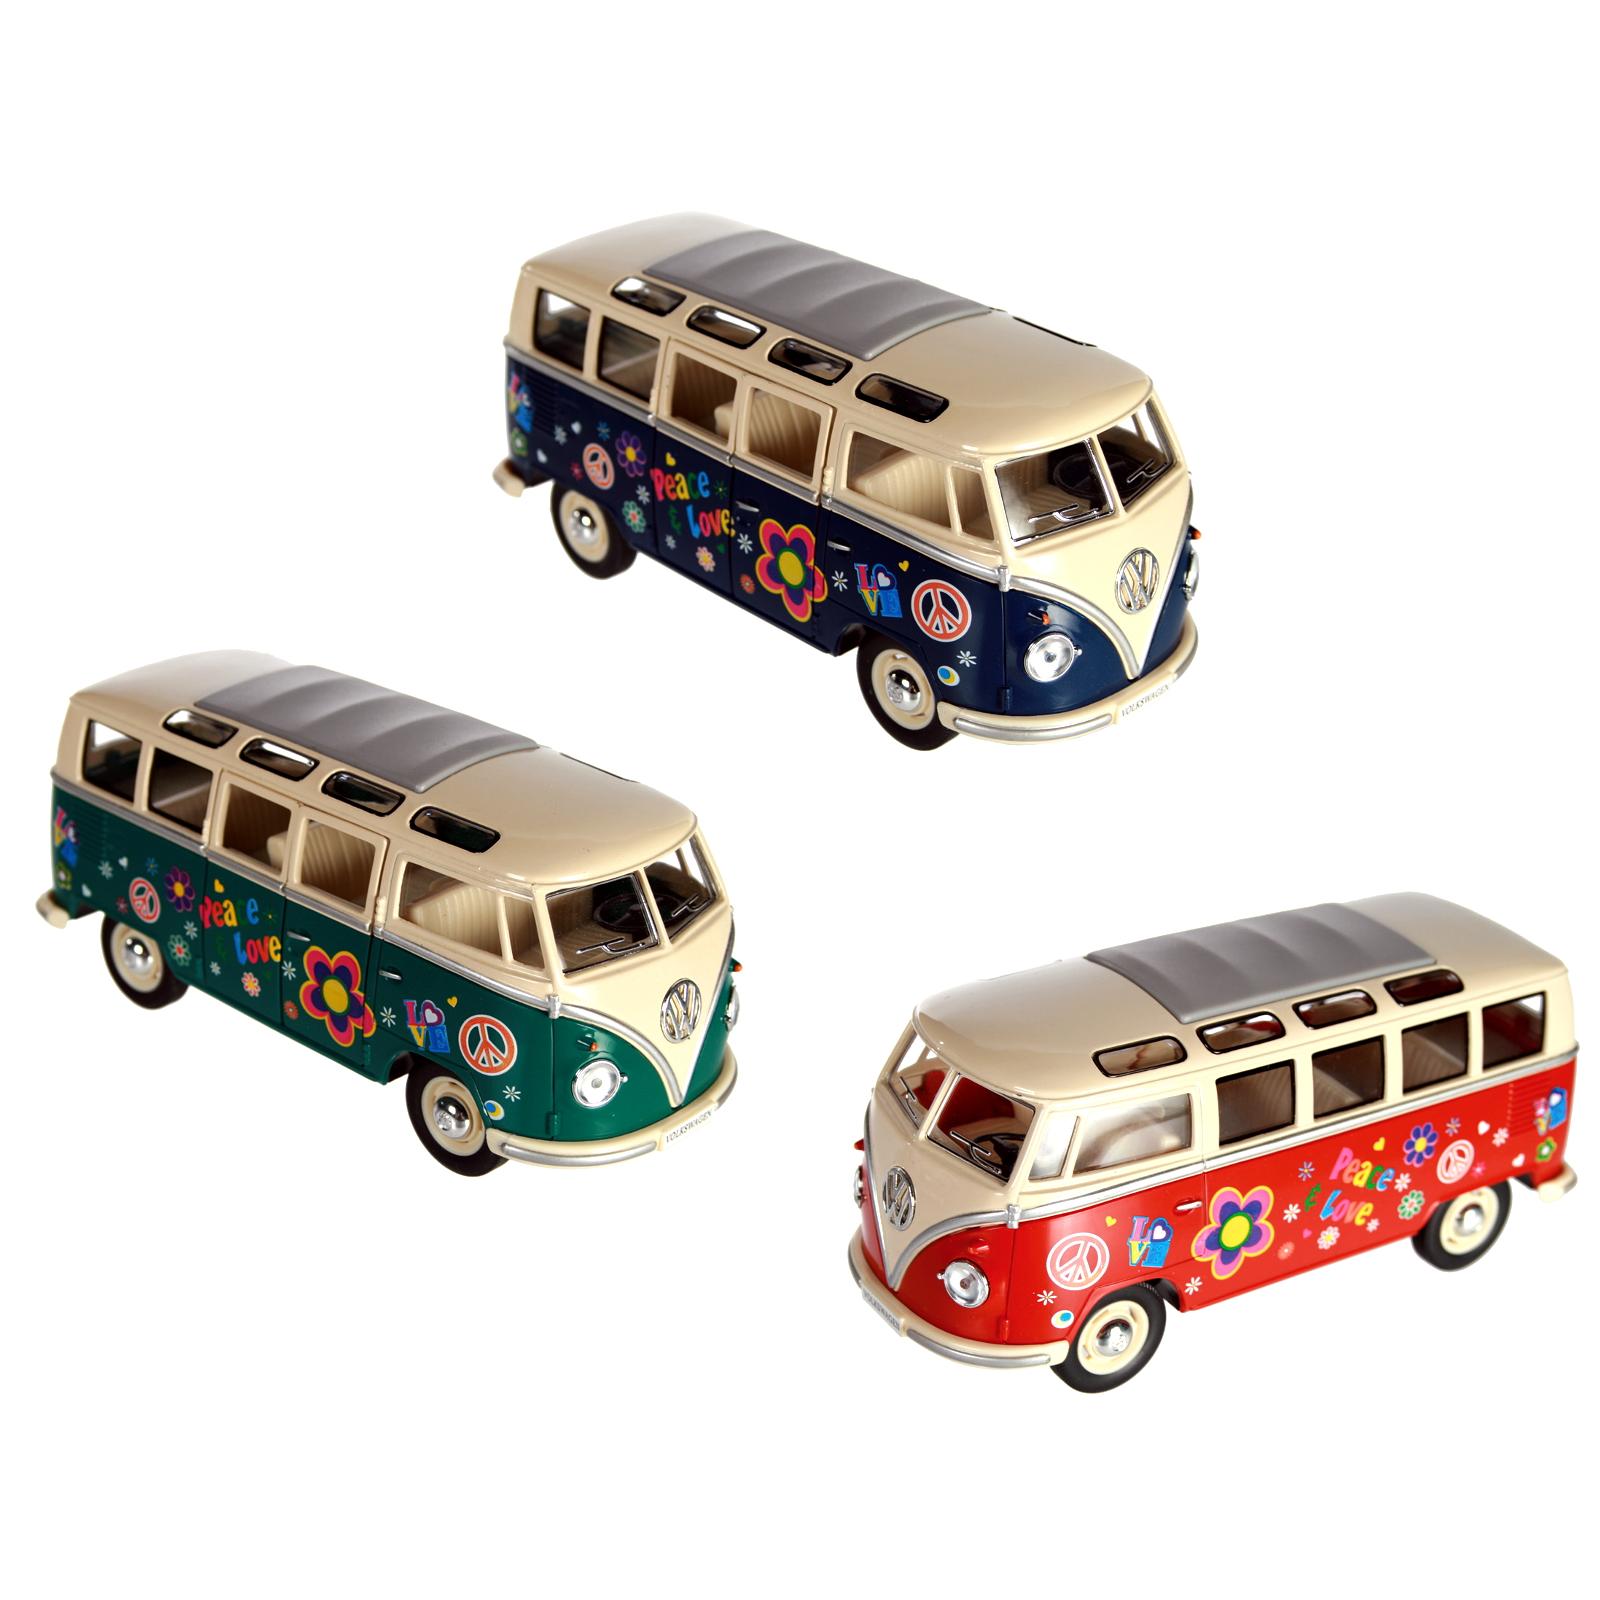 vw bulli t1 model car toy car bus collectable grafitti. Black Bedroom Furniture Sets. Home Design Ideas